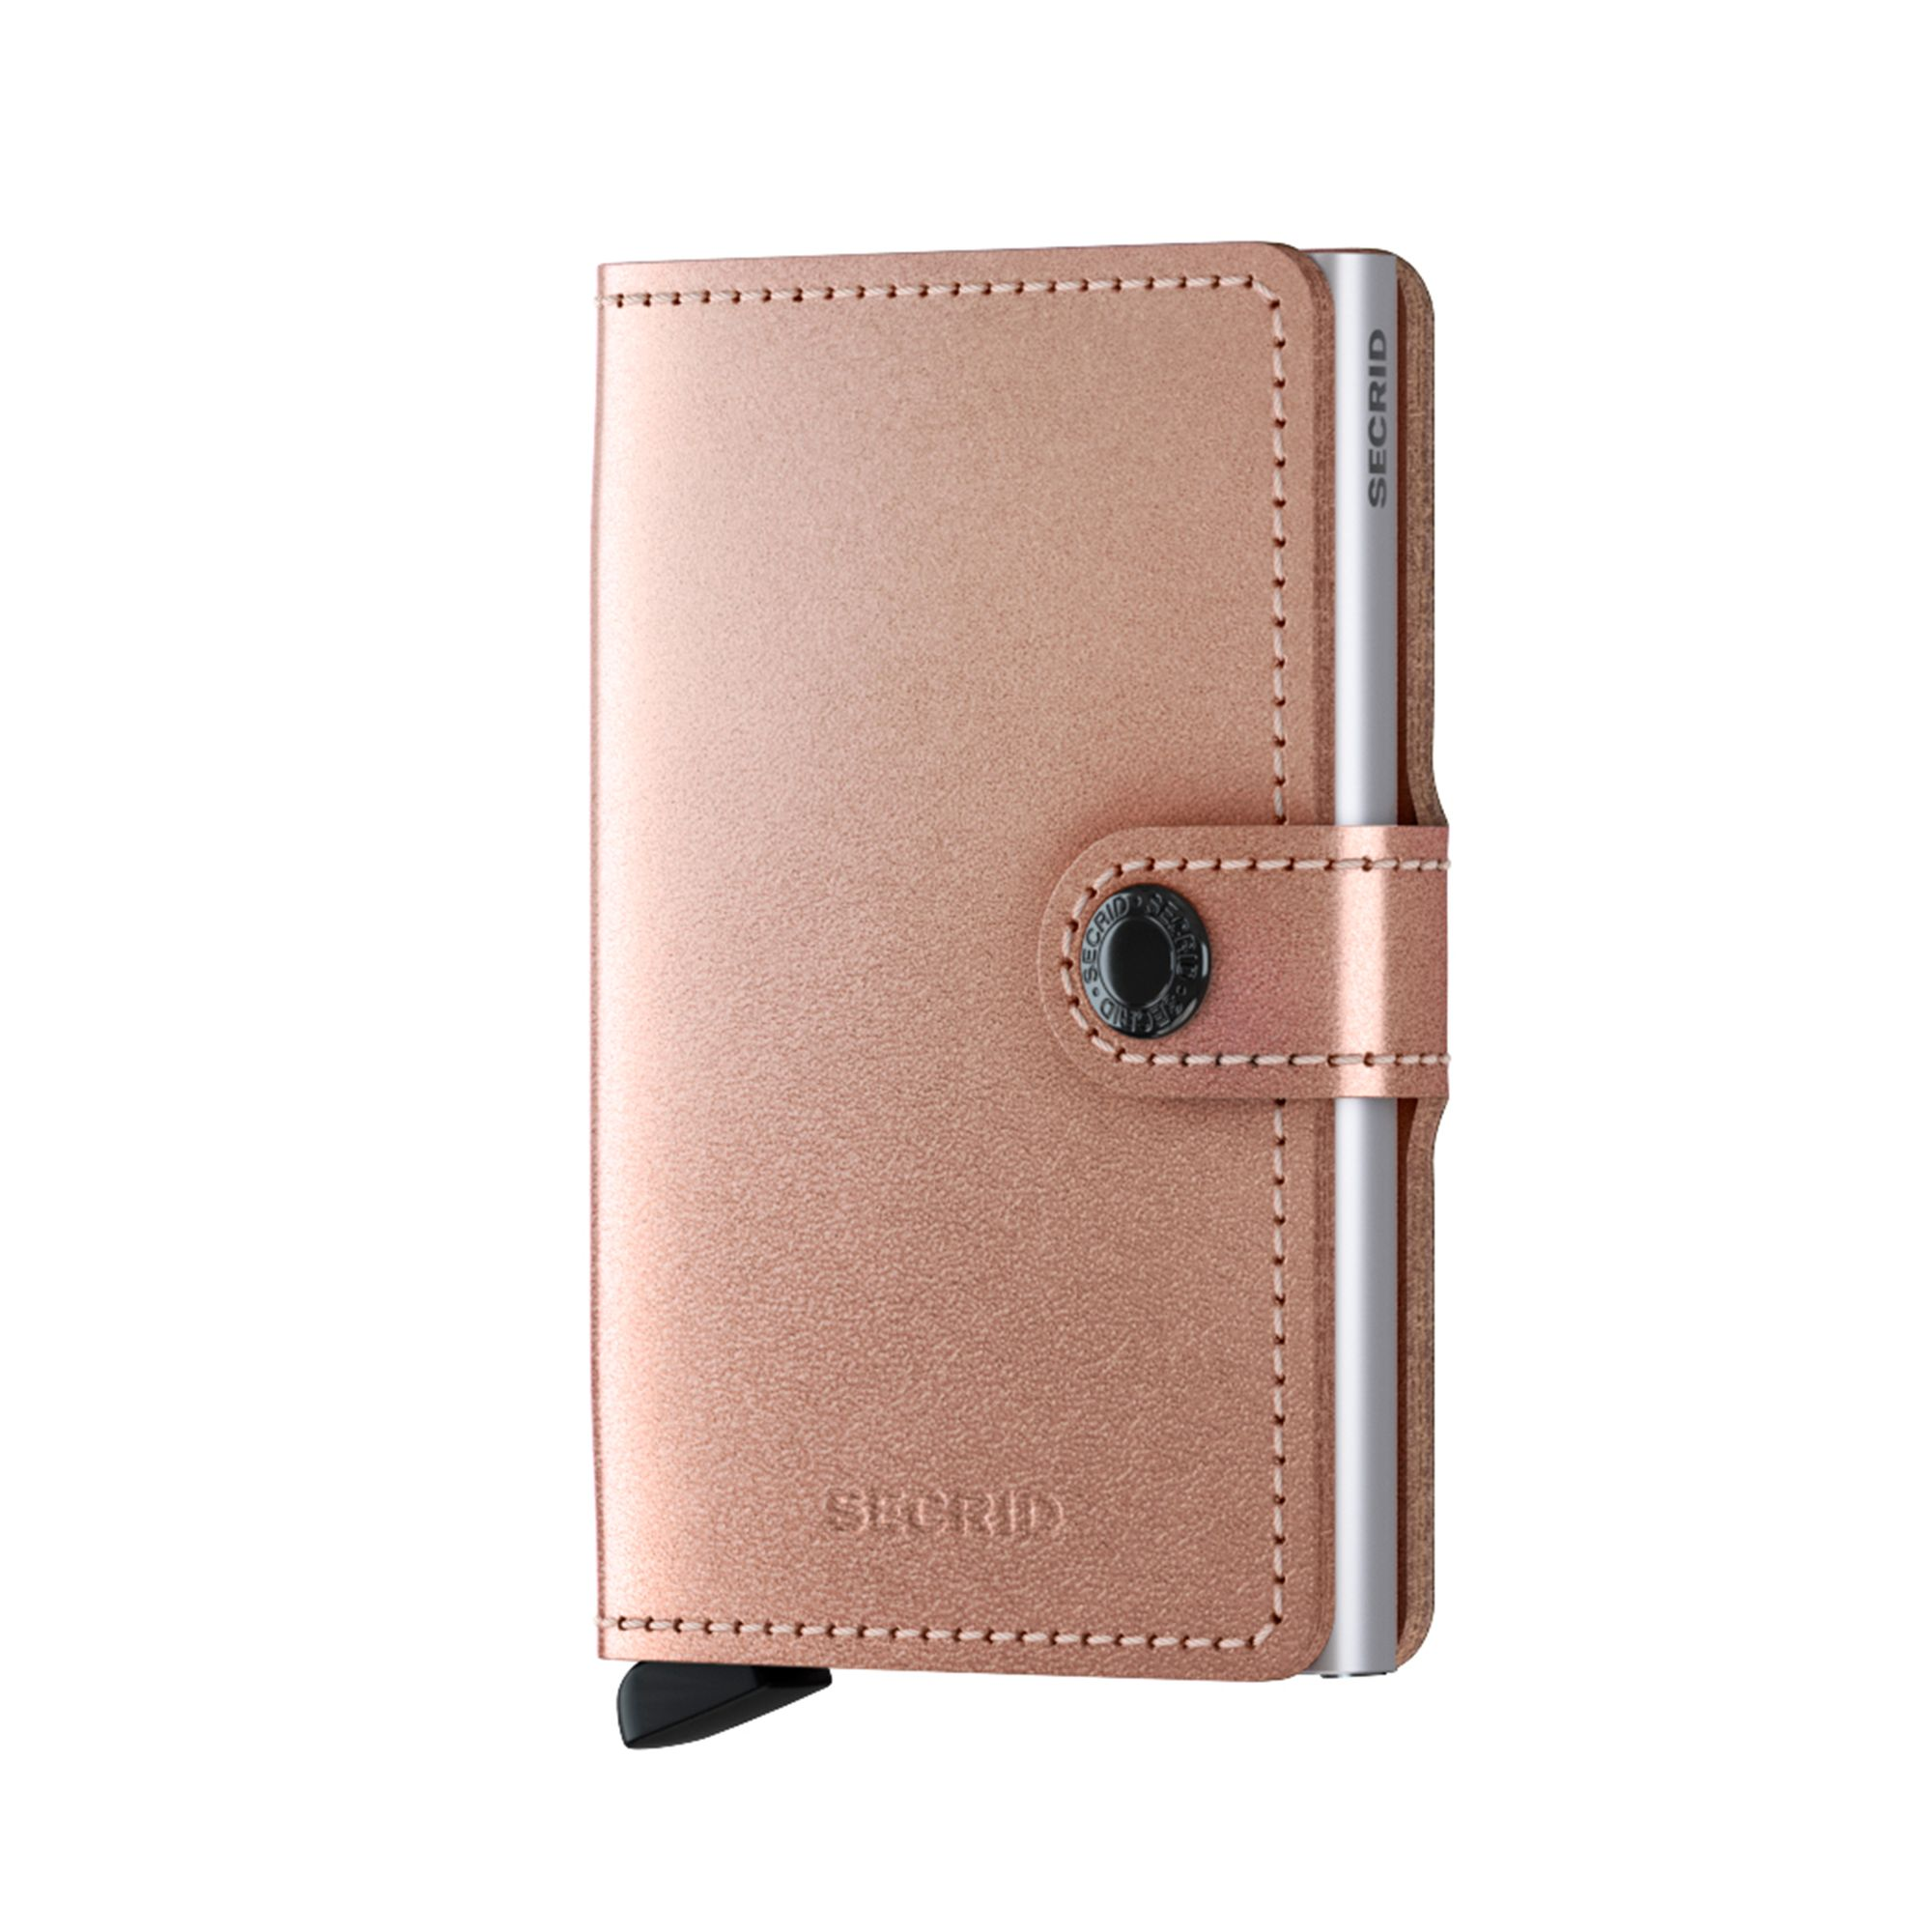 Secrid Miniwallet Metallic liten plånbok, Koppar